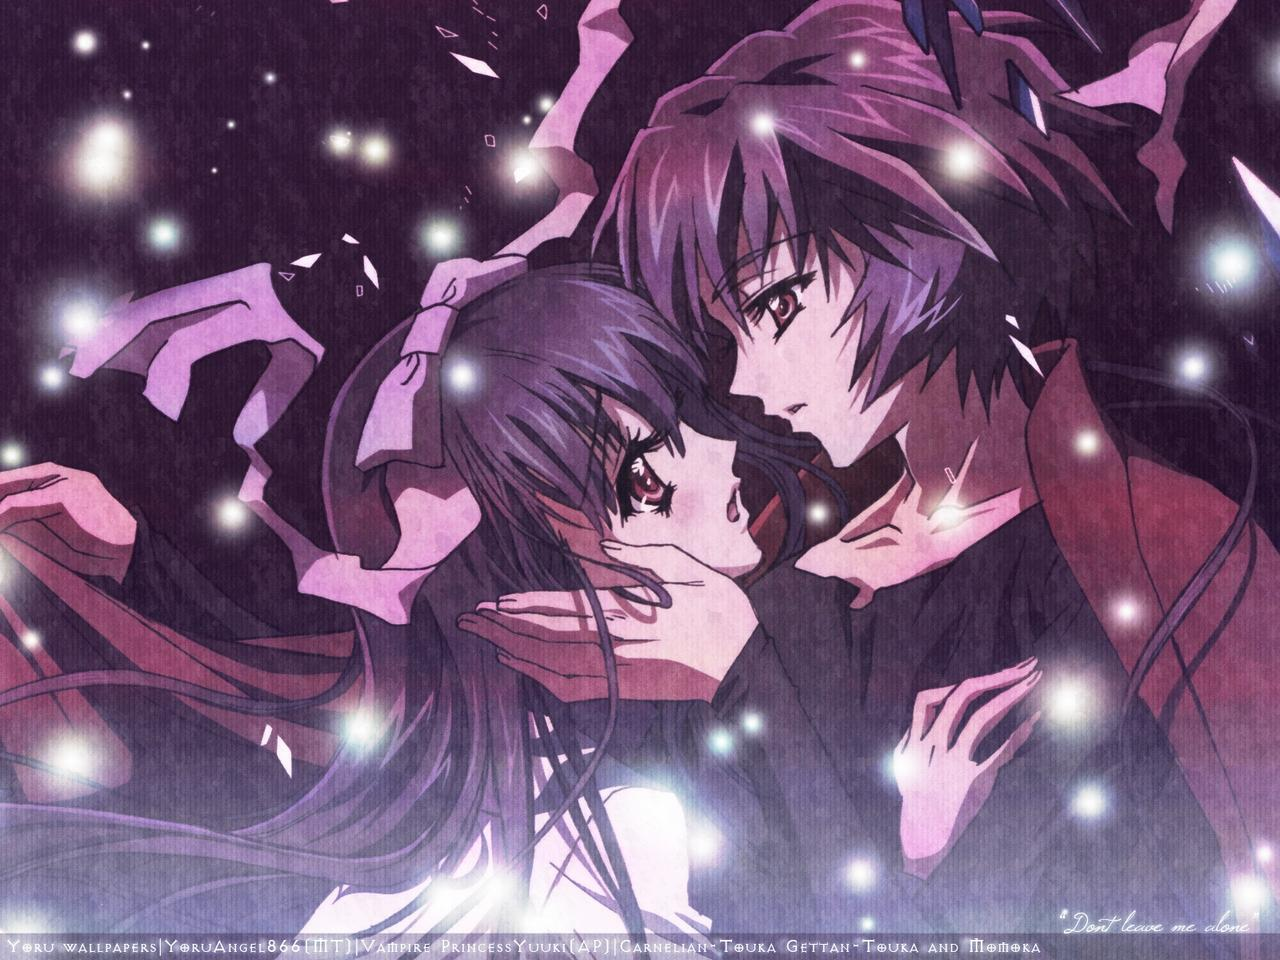 The World Of Anime Touka Gettan